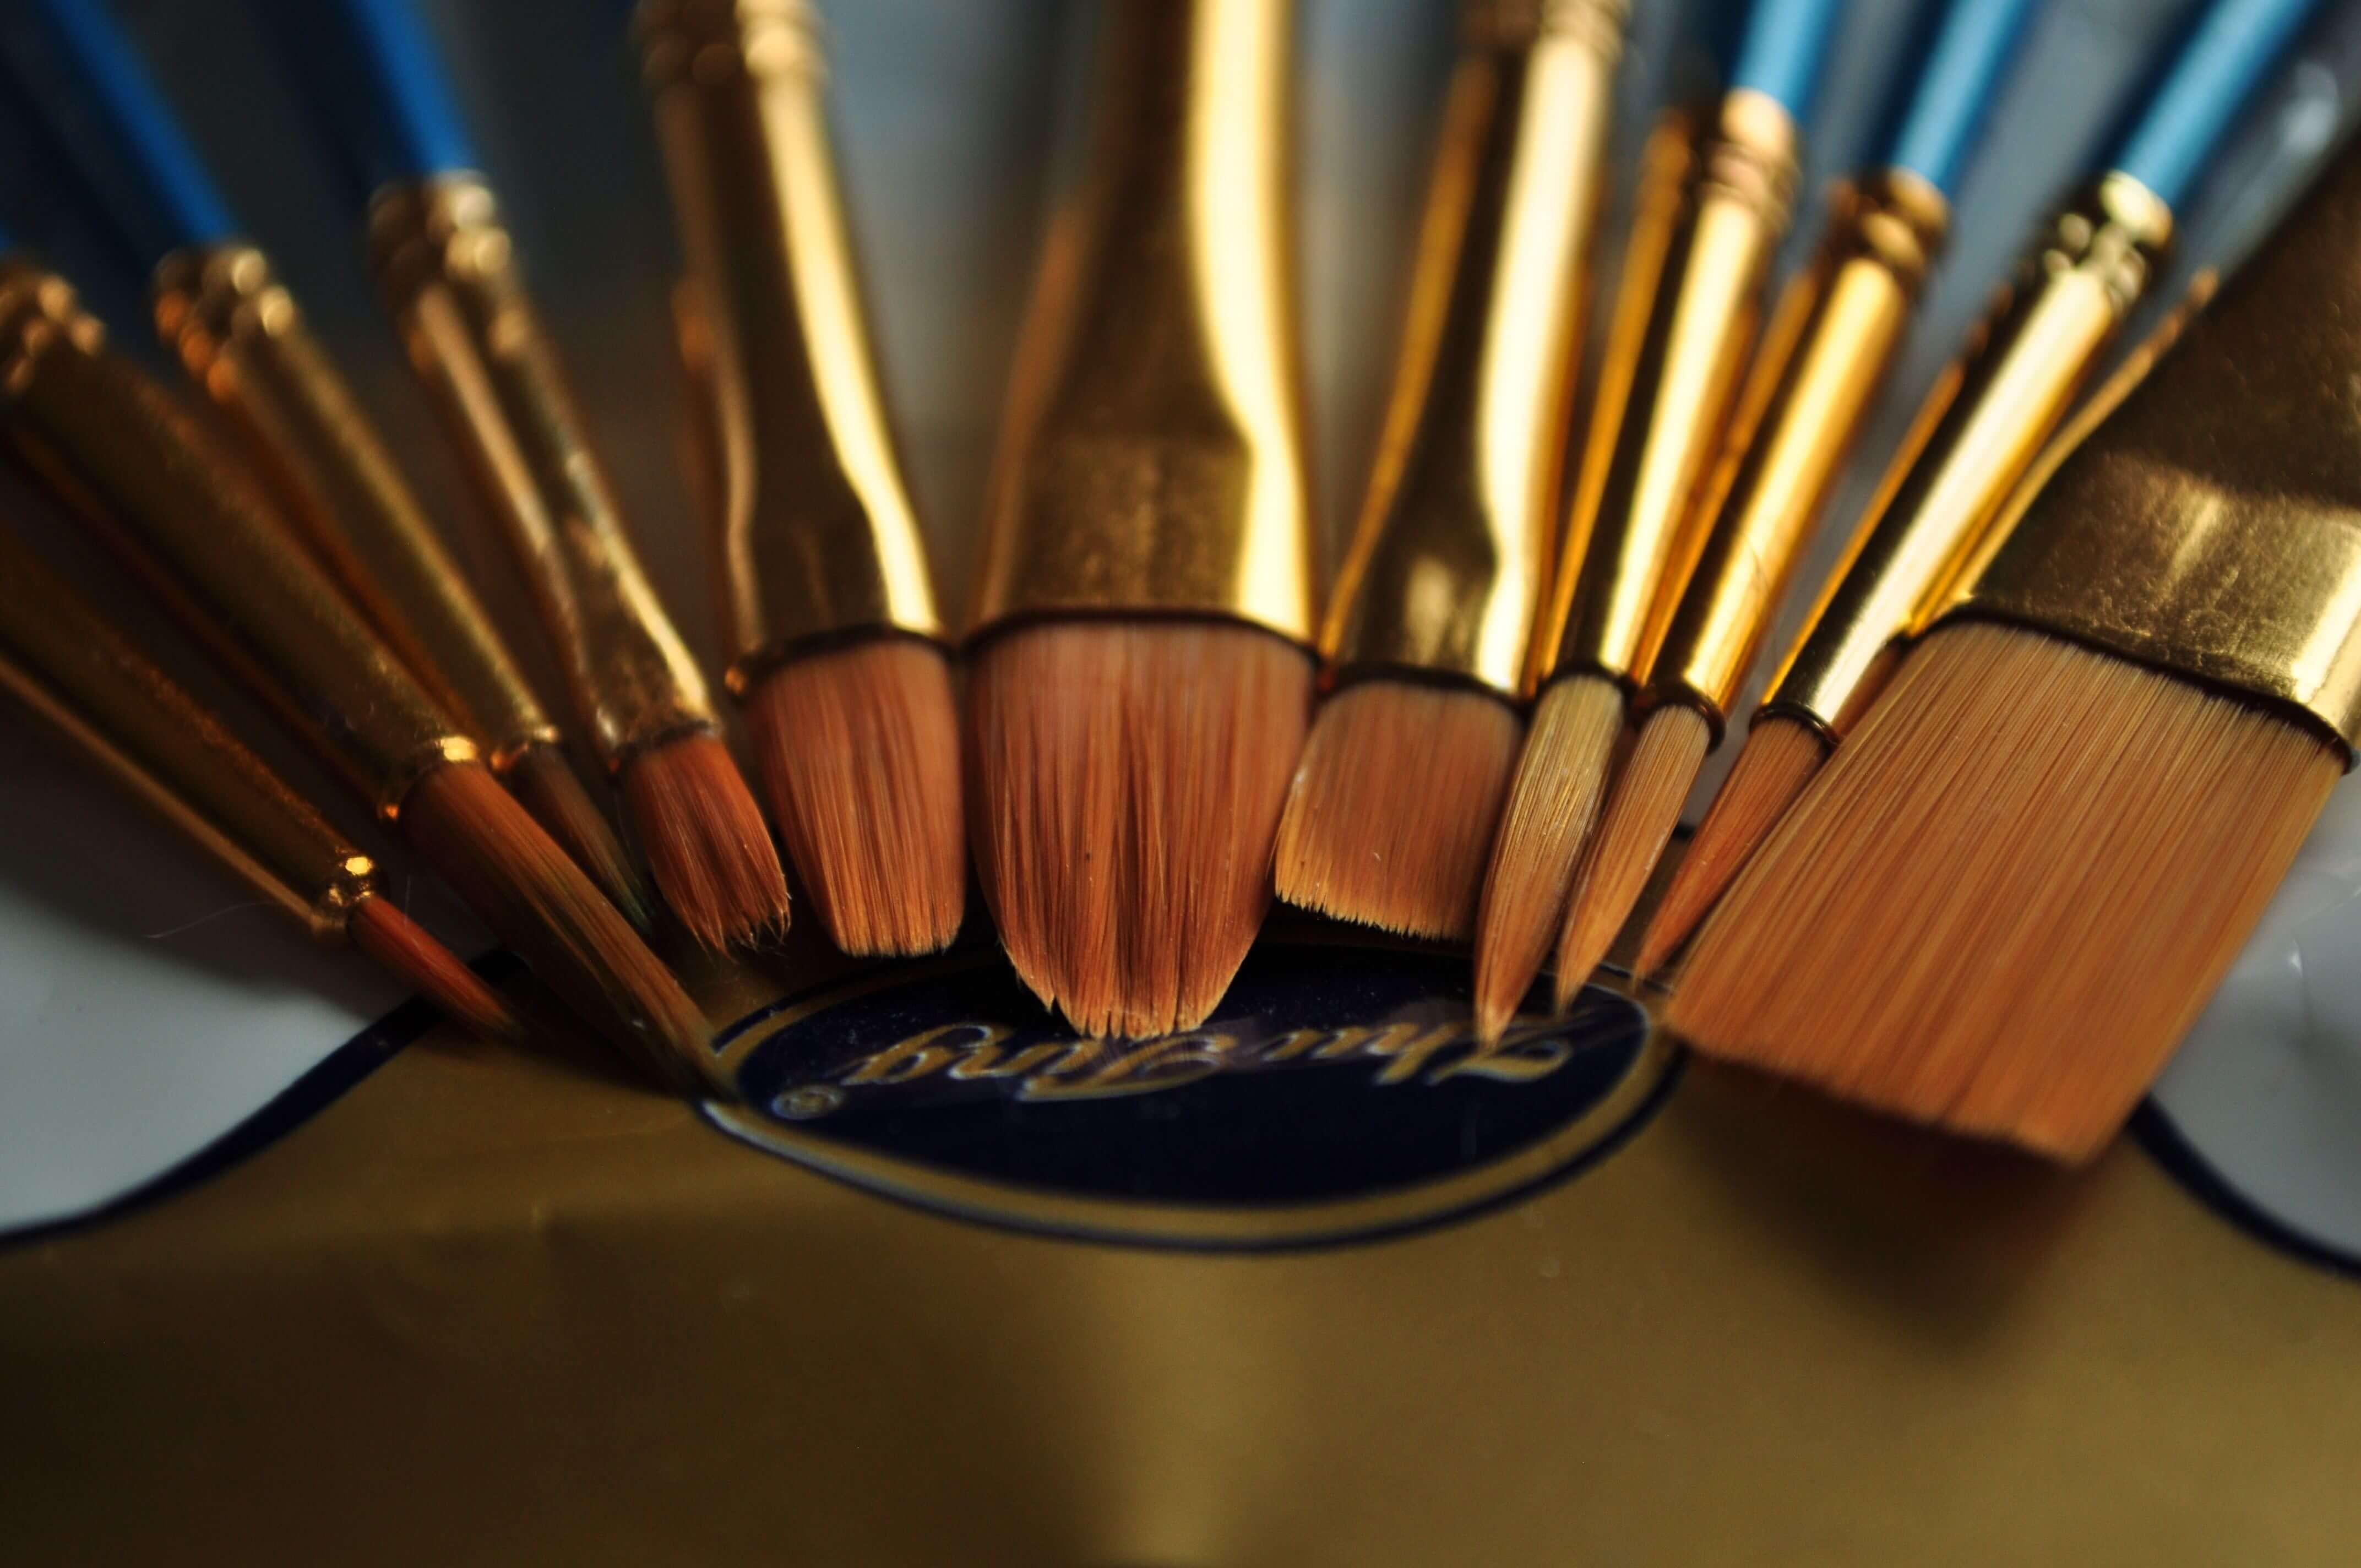 paint brushes 3